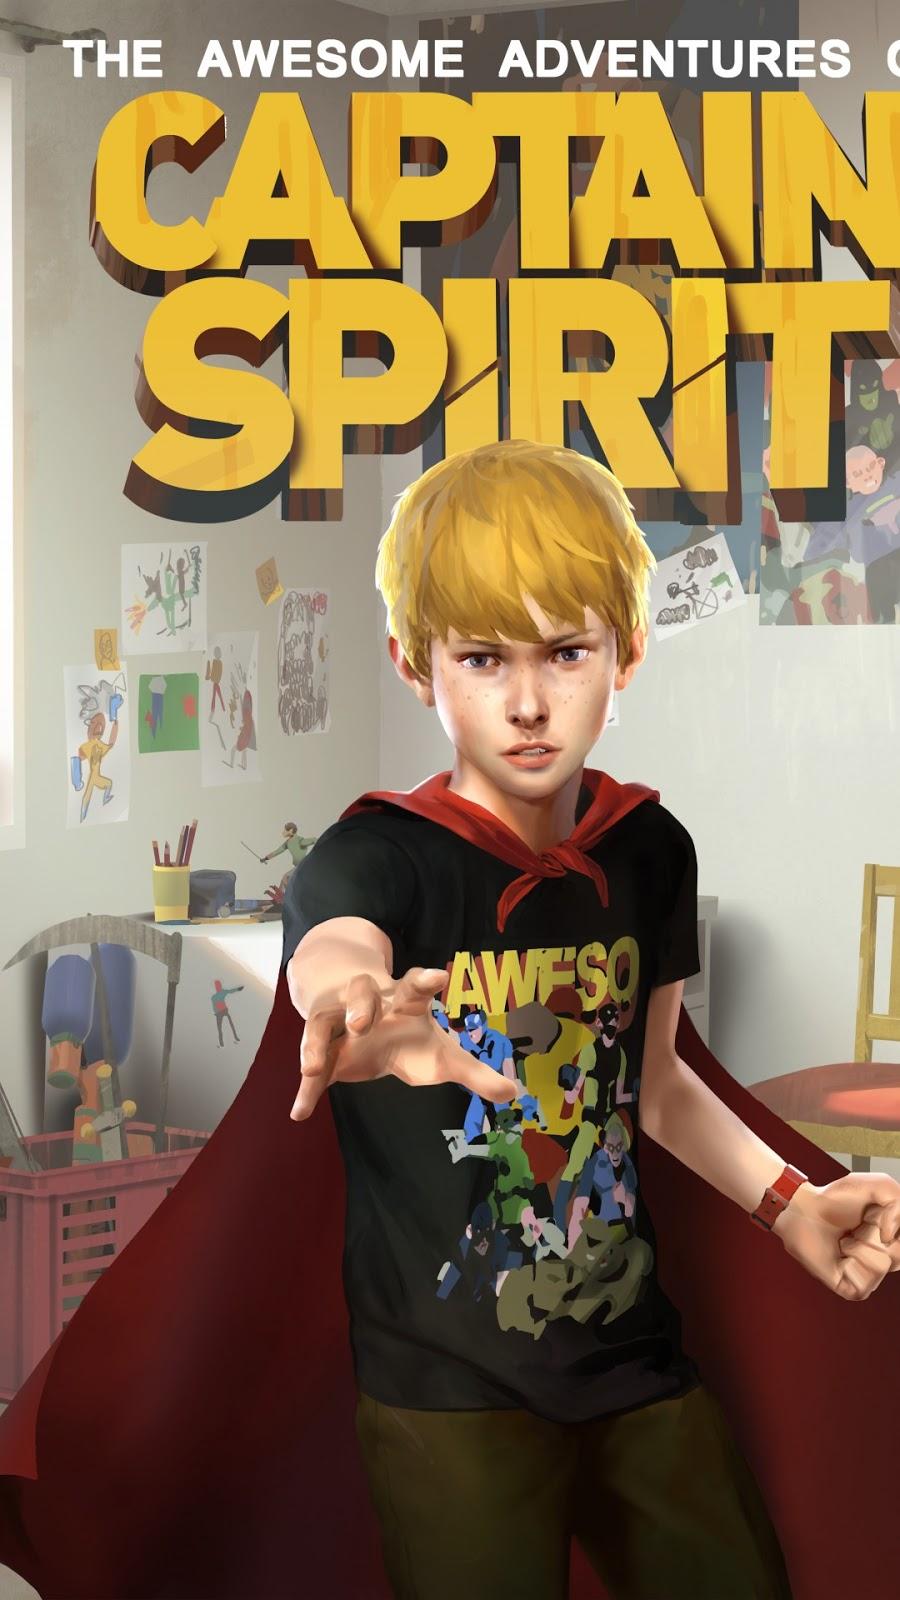 Papel de parede grátis jogo The Awesome Adventures of Captain Spirit para PC, Notebook, iPhone, Android e Tablet.